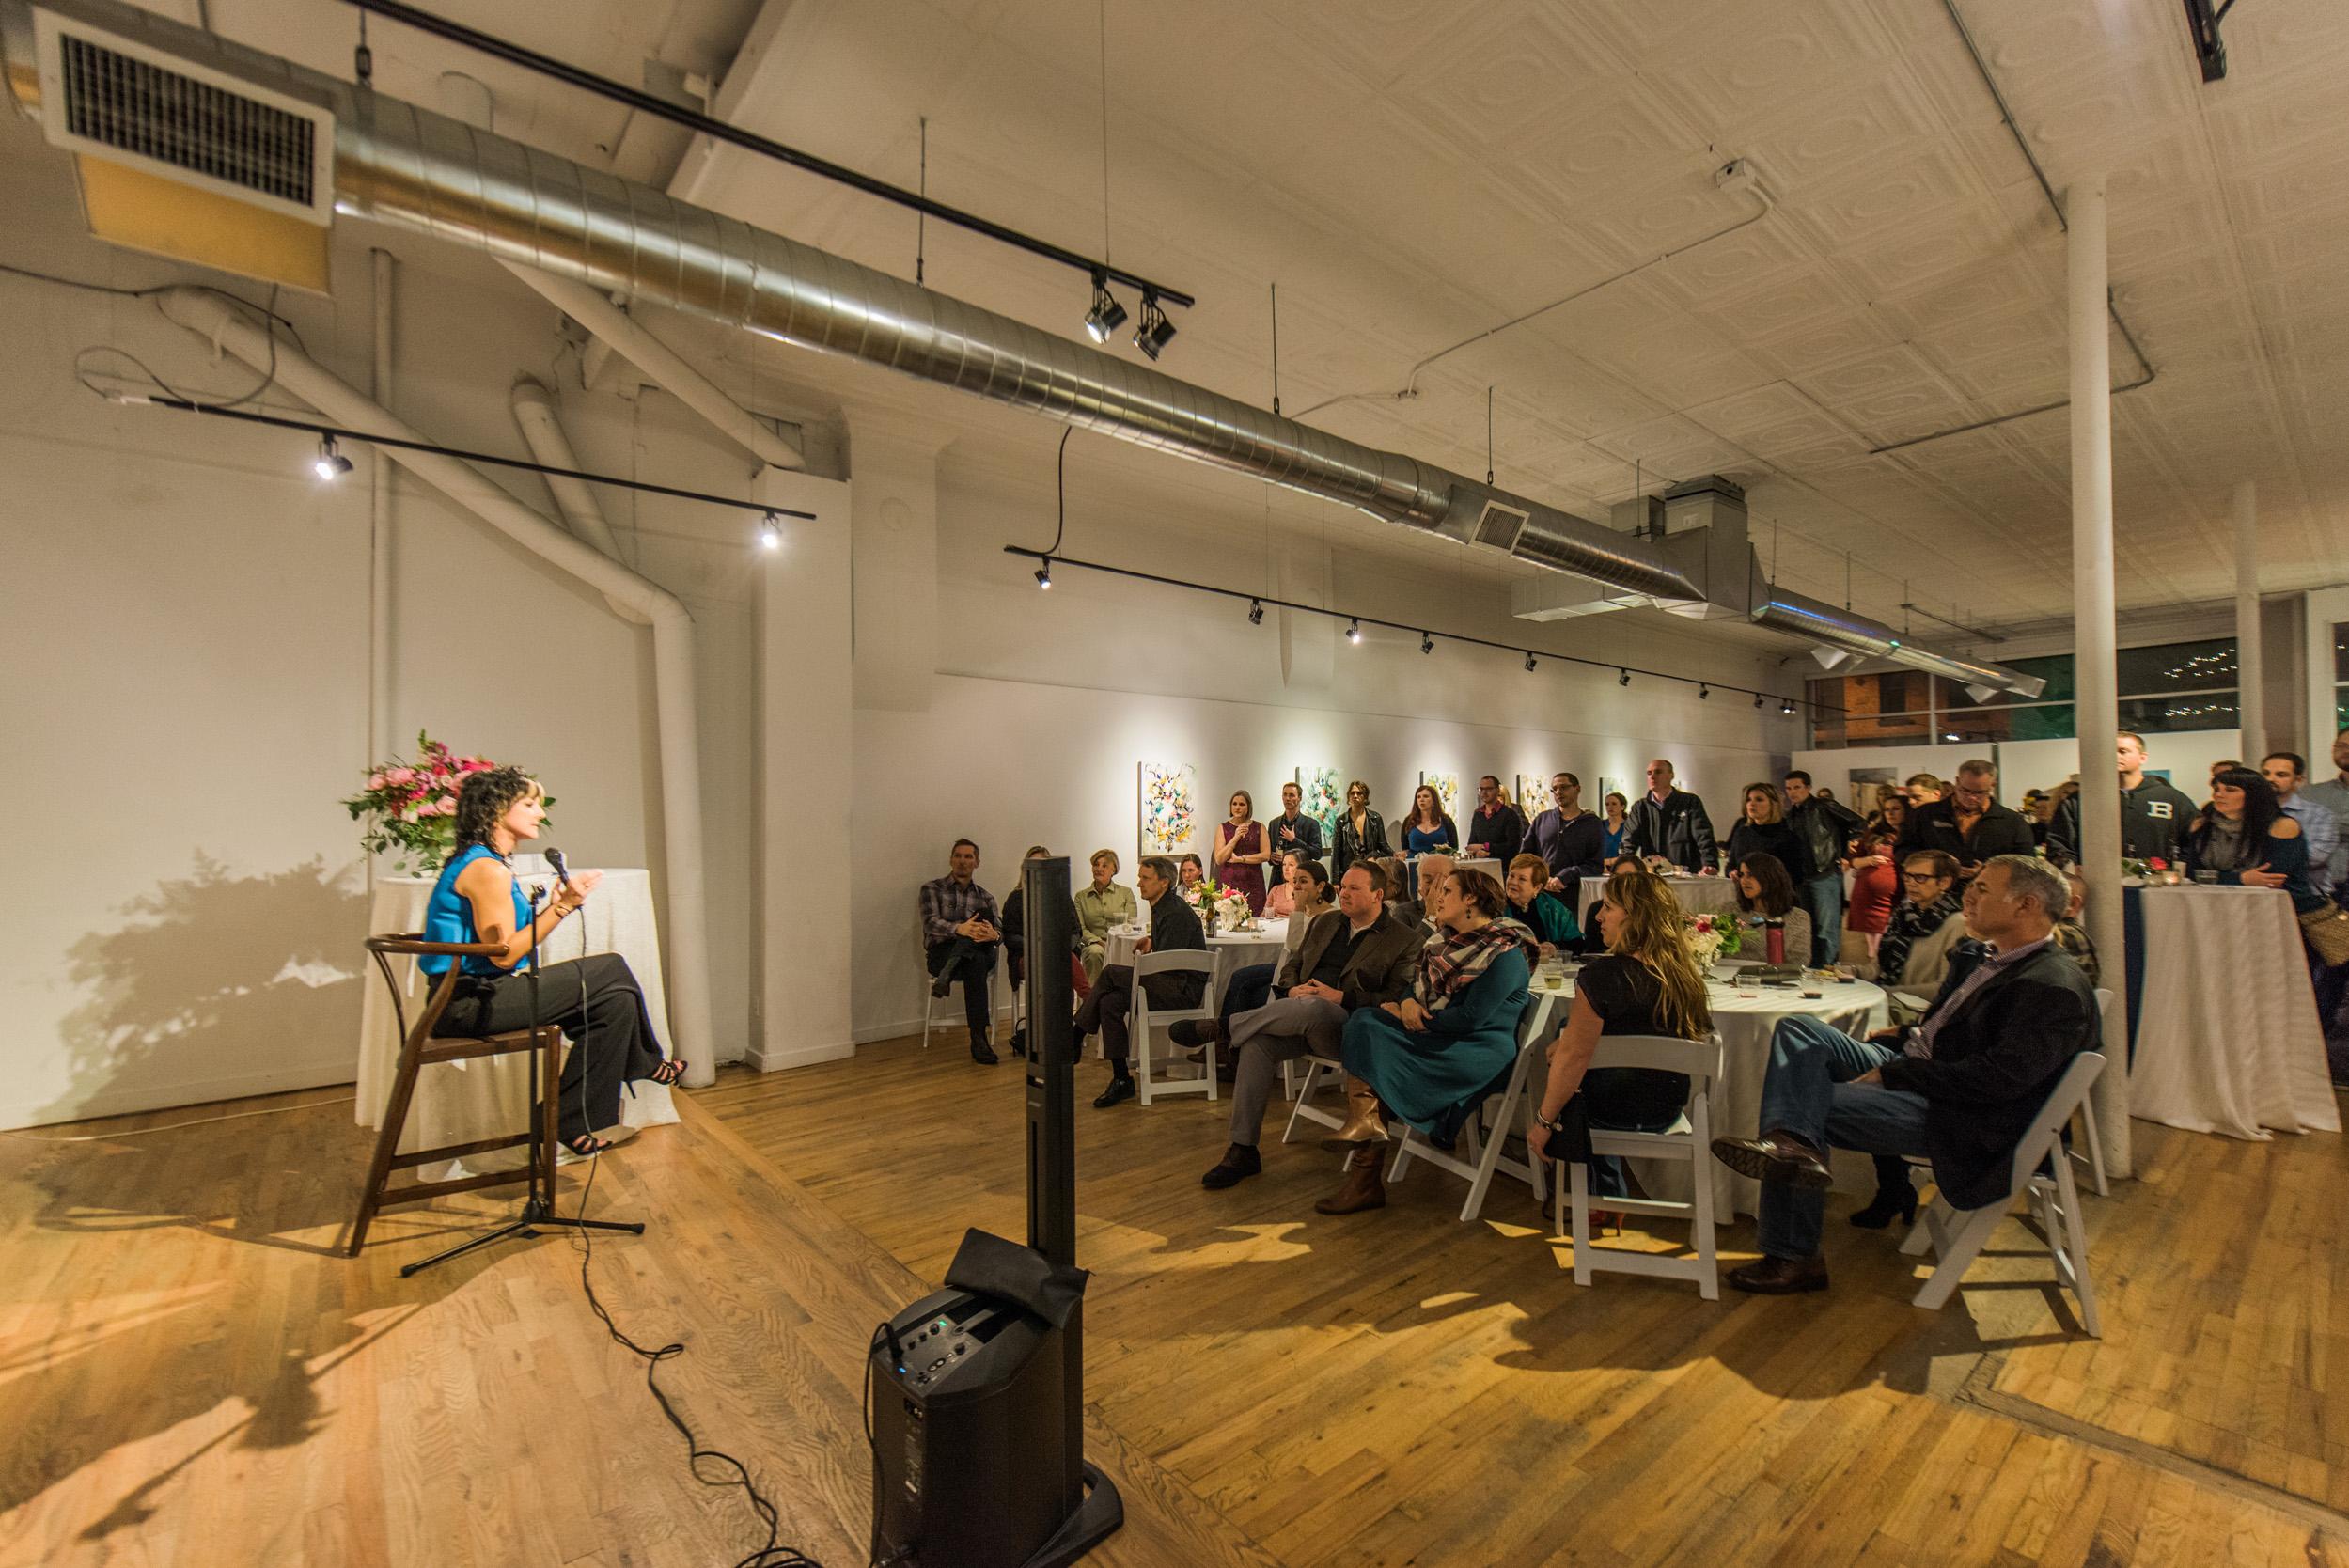 Britt_Nemeth_Studios_PhotographyLive_Events_Elopements_Launches_Ceremony_Gatherings_Yoga_Retreat061.jpg